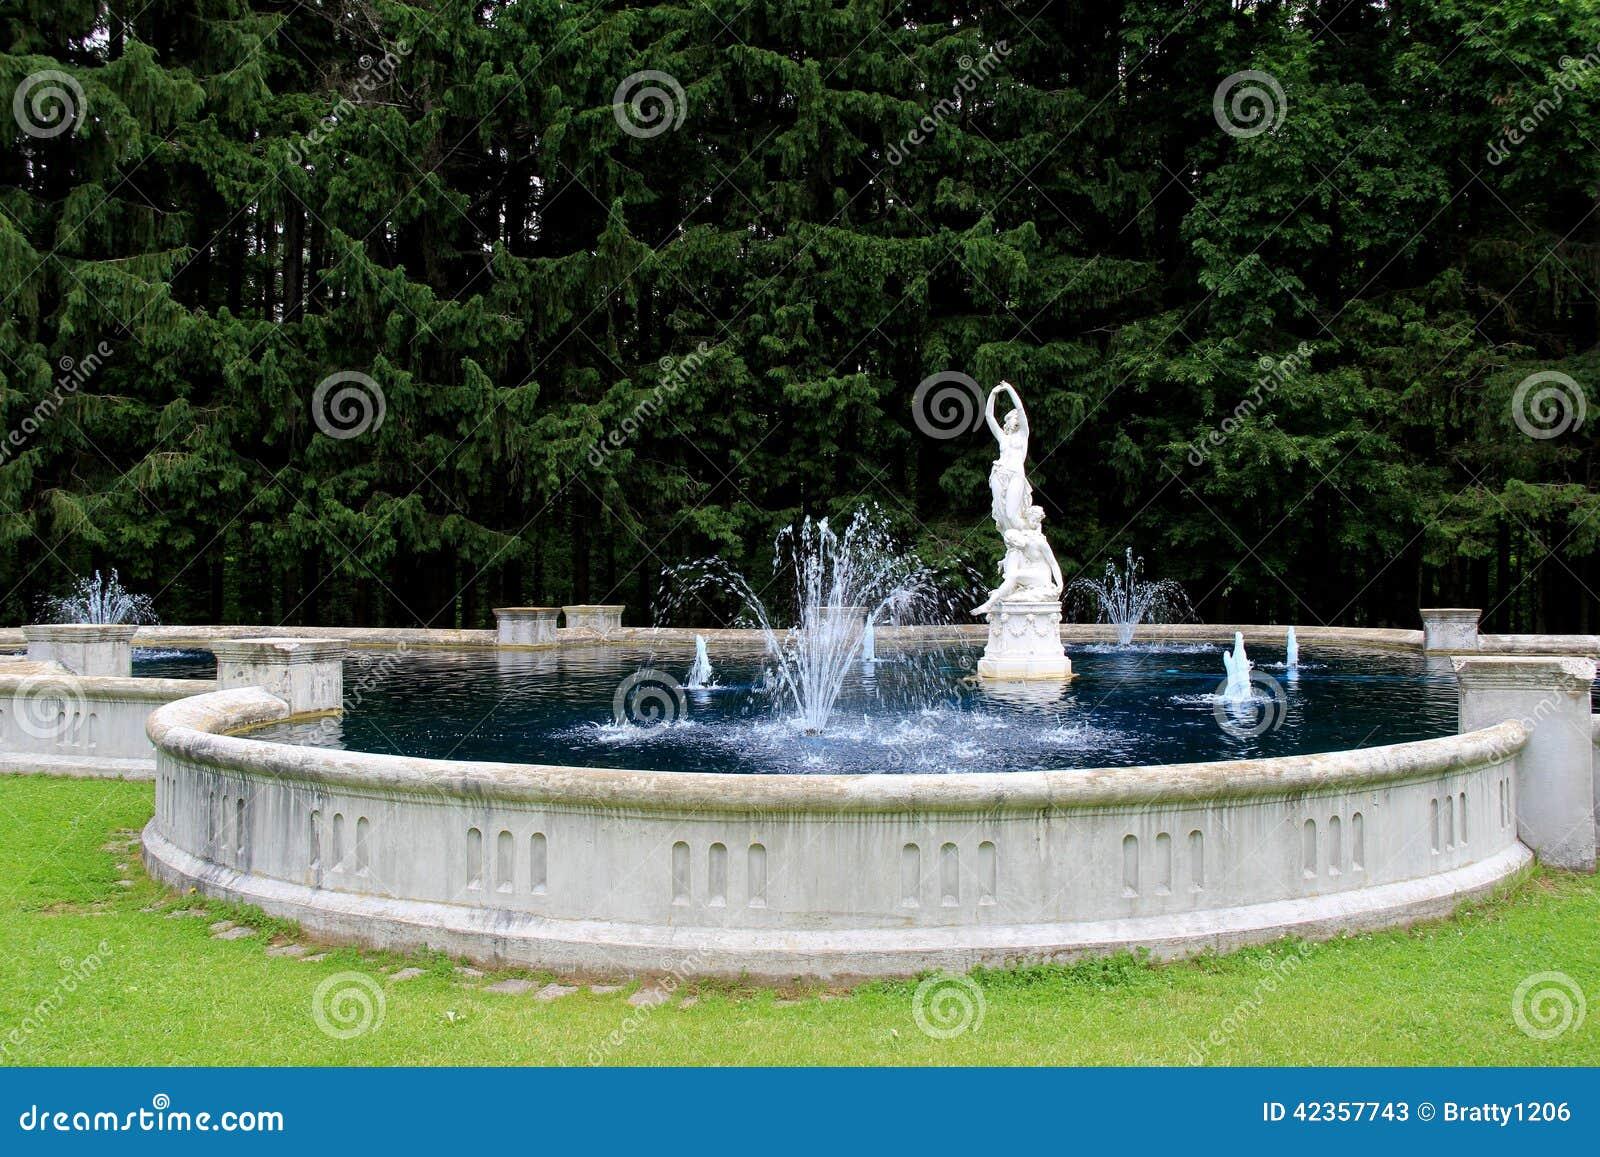 Beautiful Water Fountain And StatuesYaddo GardensSaratoga SpringsNew